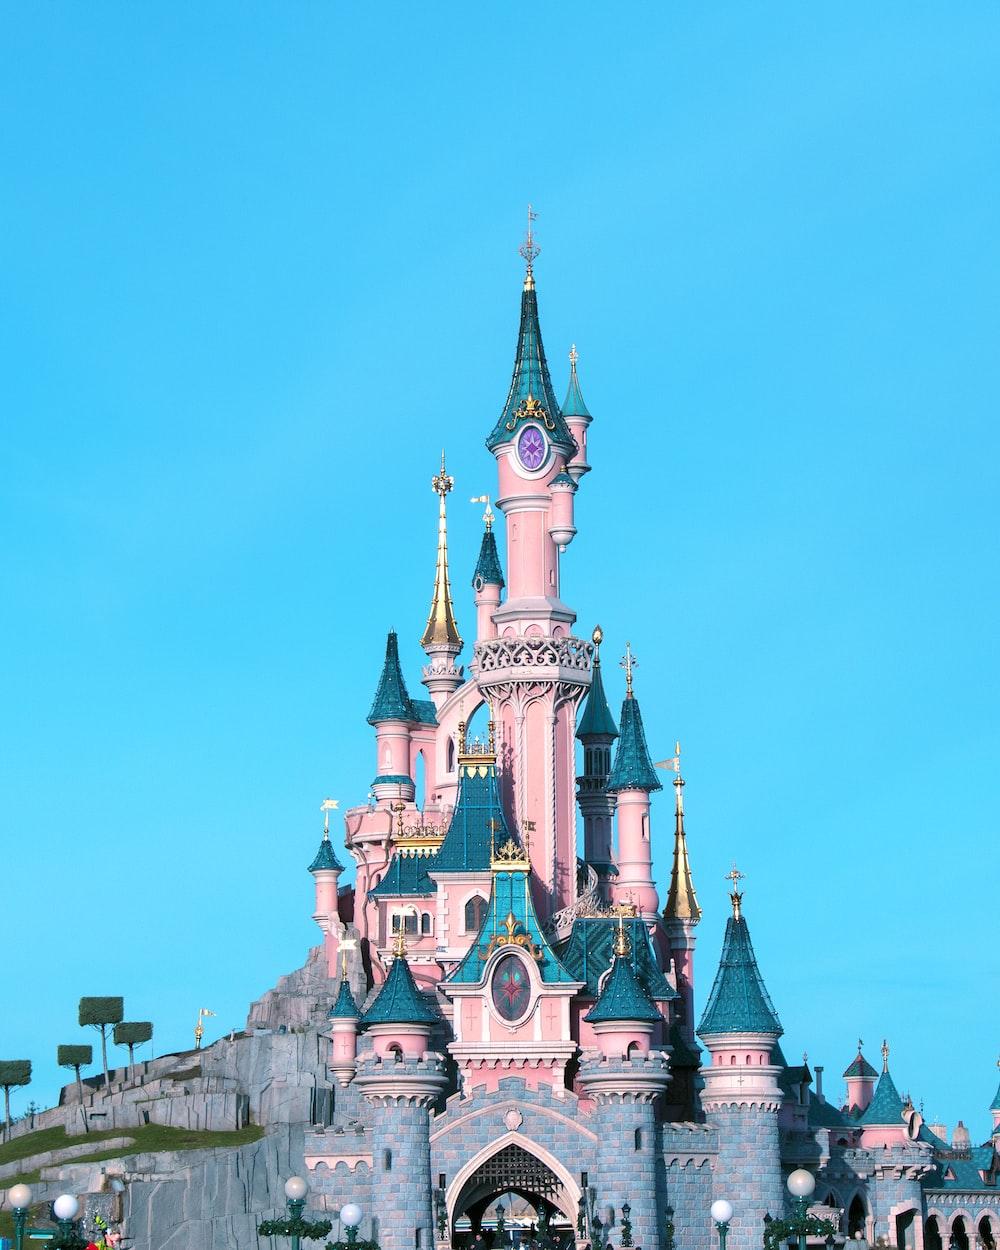 Disneyland park, Sleeping Beauty's castle